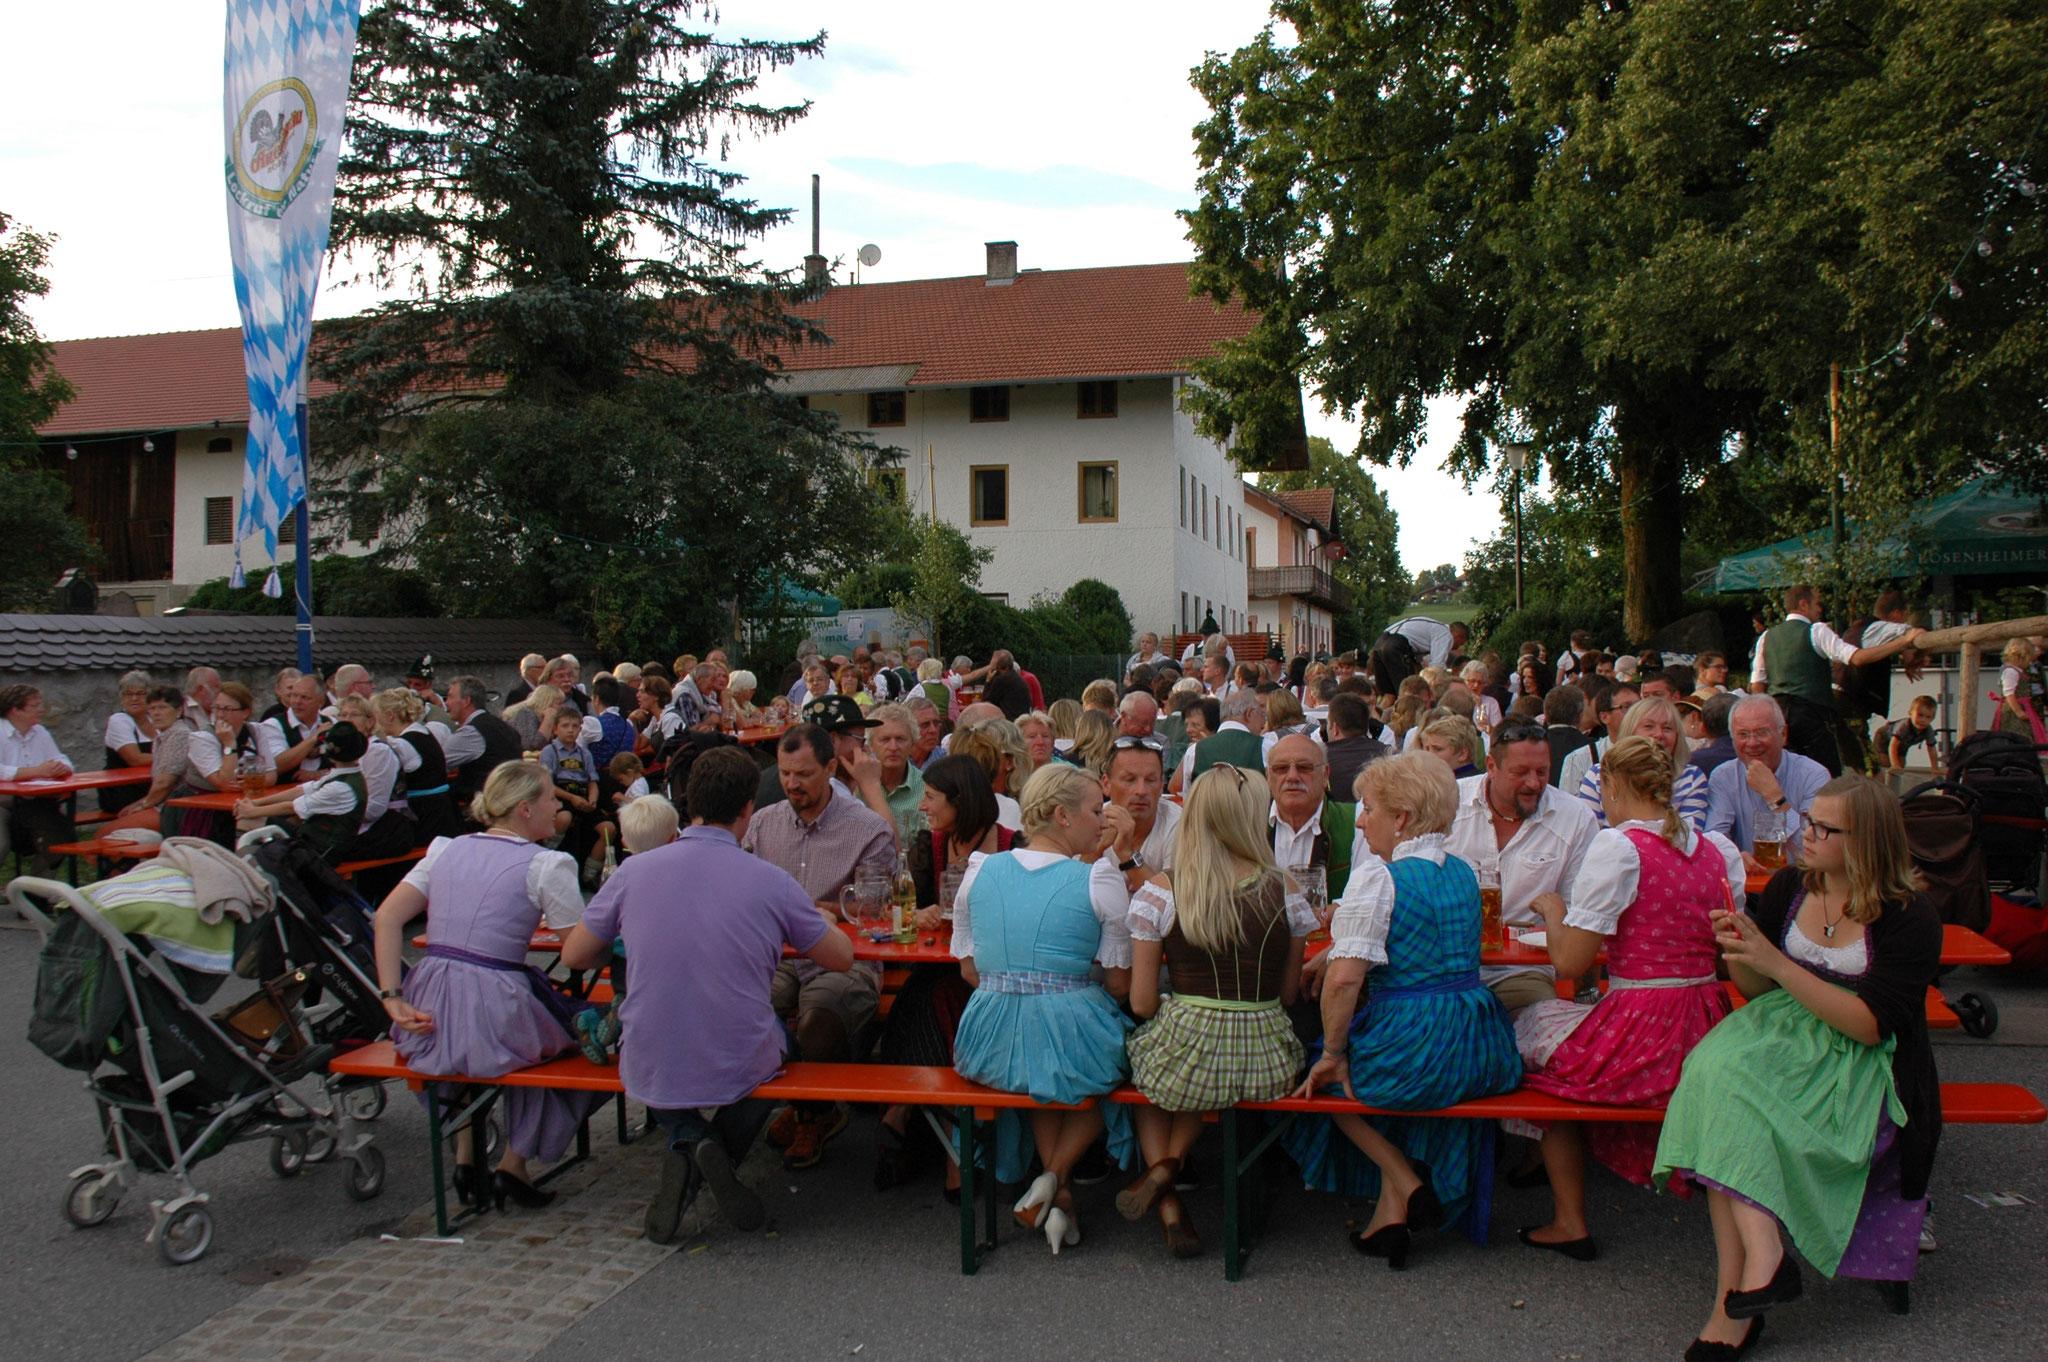 Leute Dorffest Lauterbach